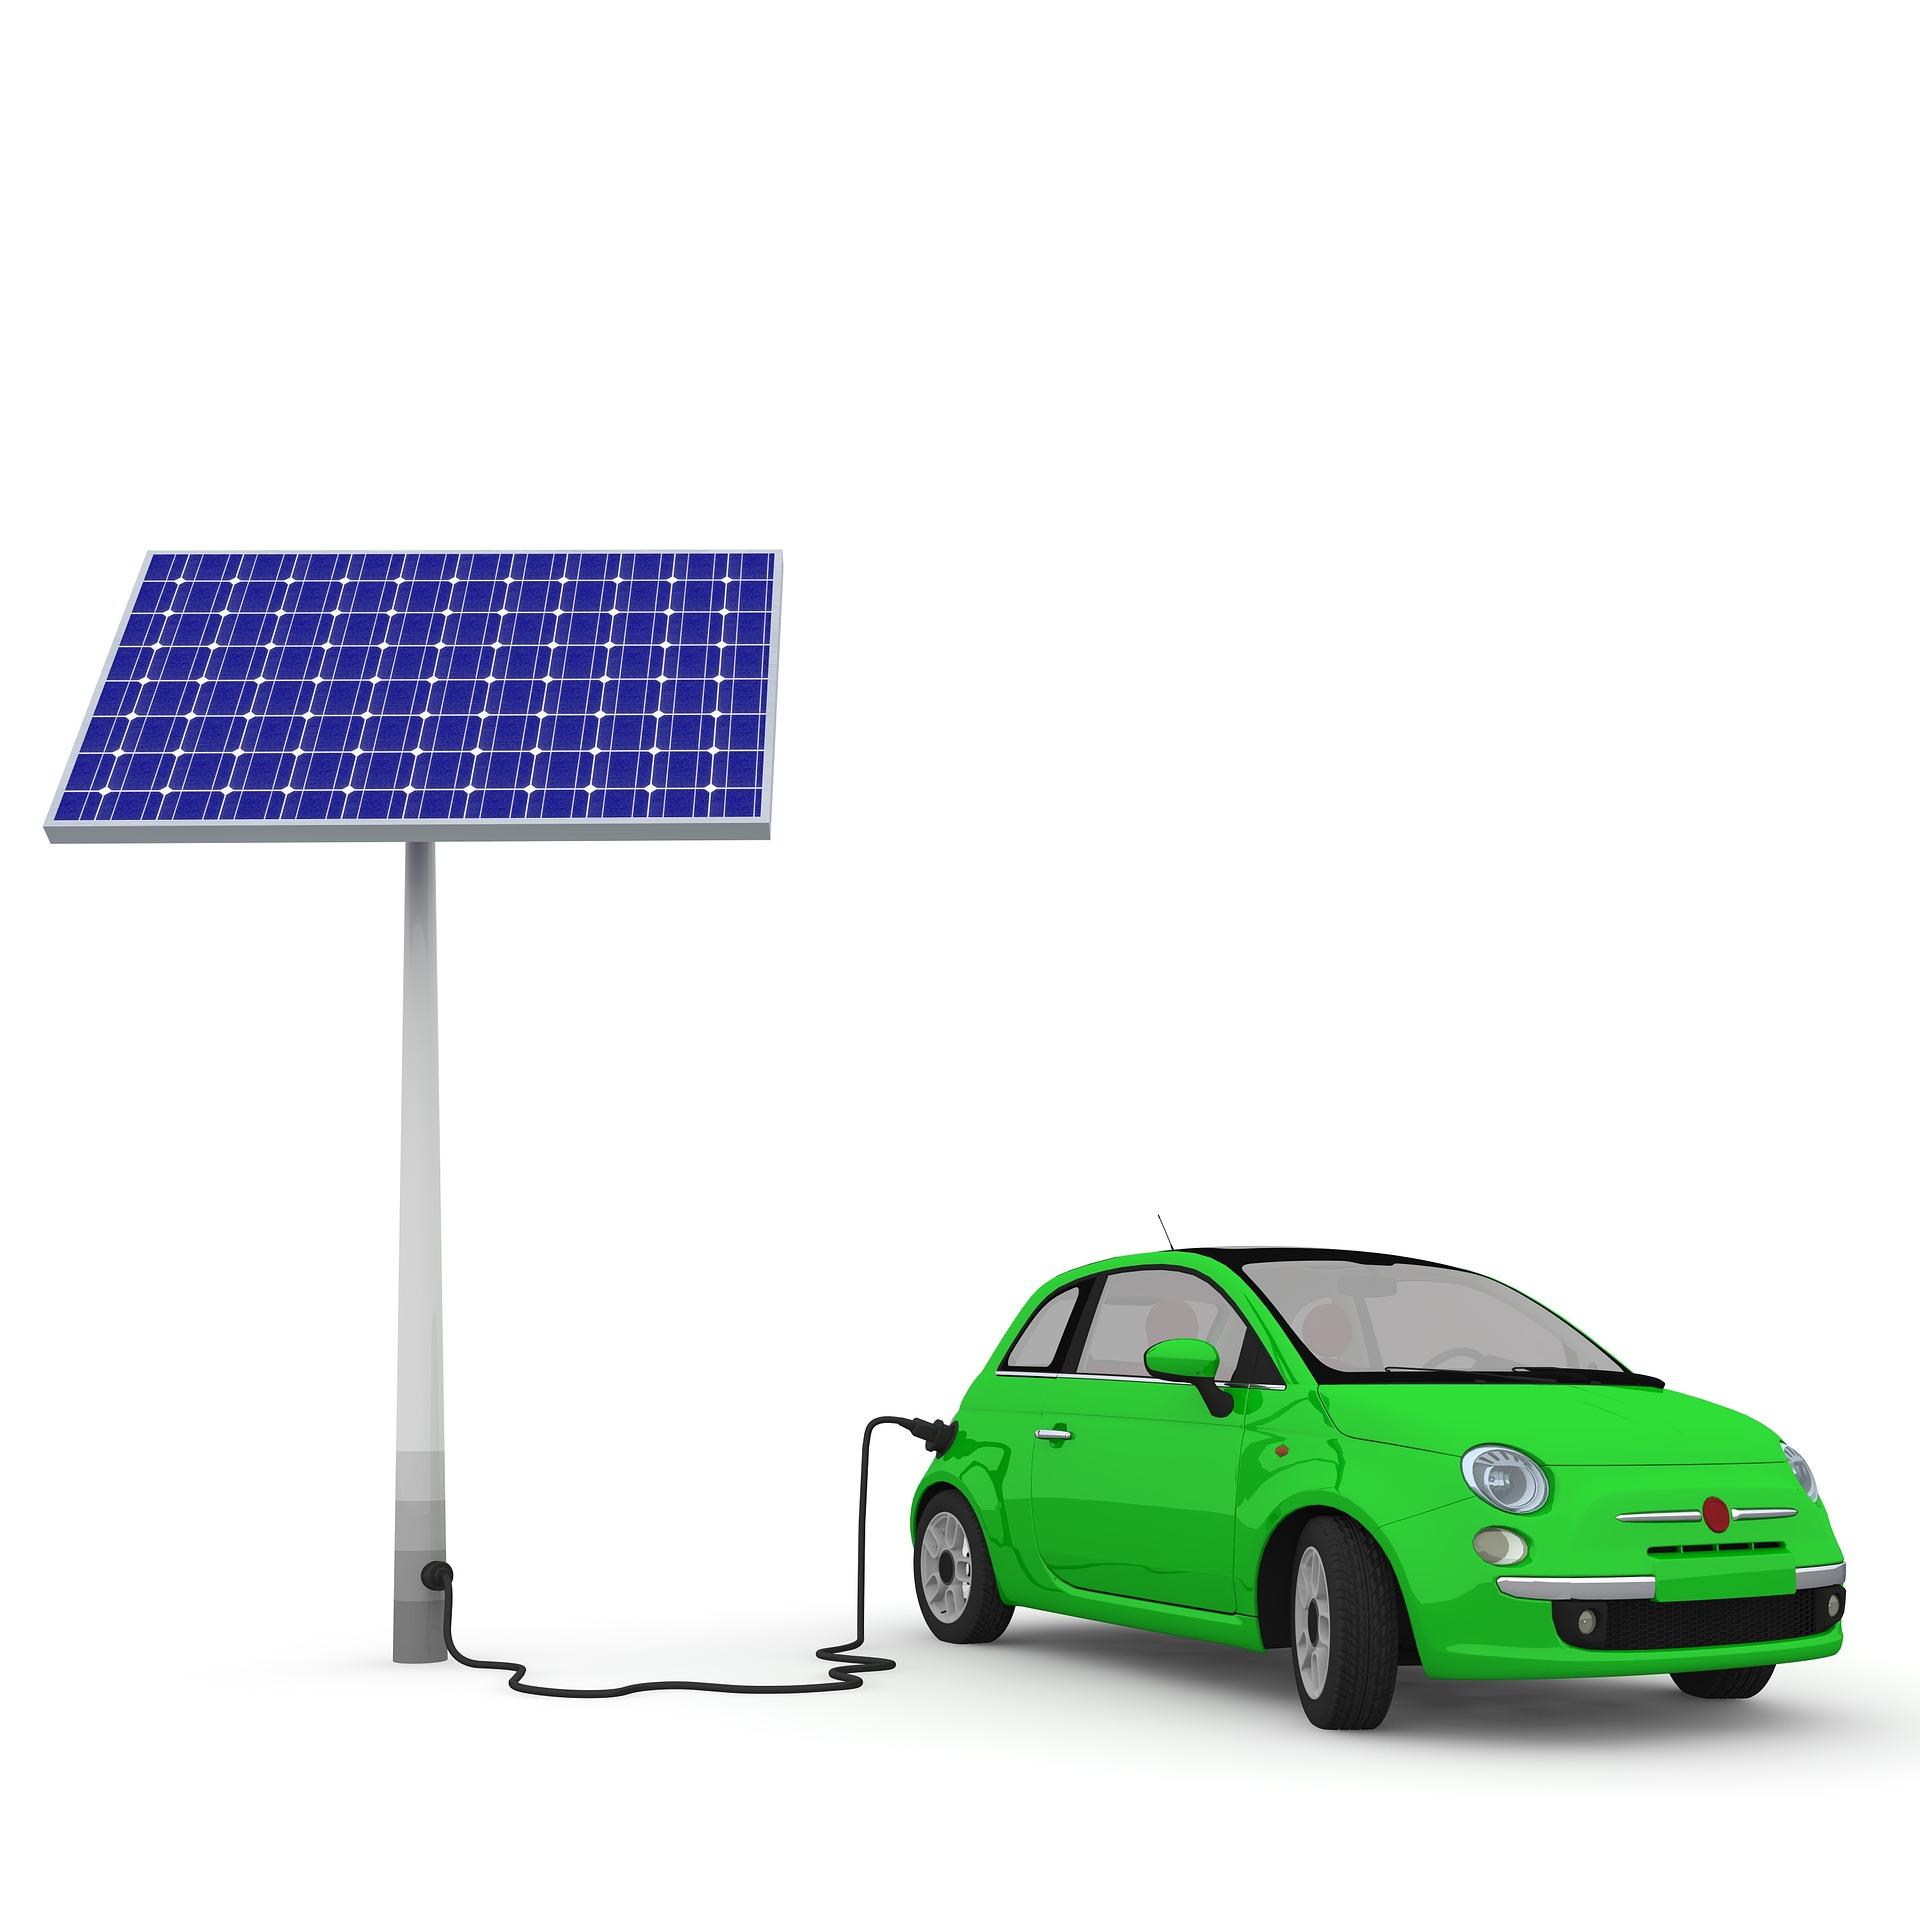 solar-power-1020194_1920